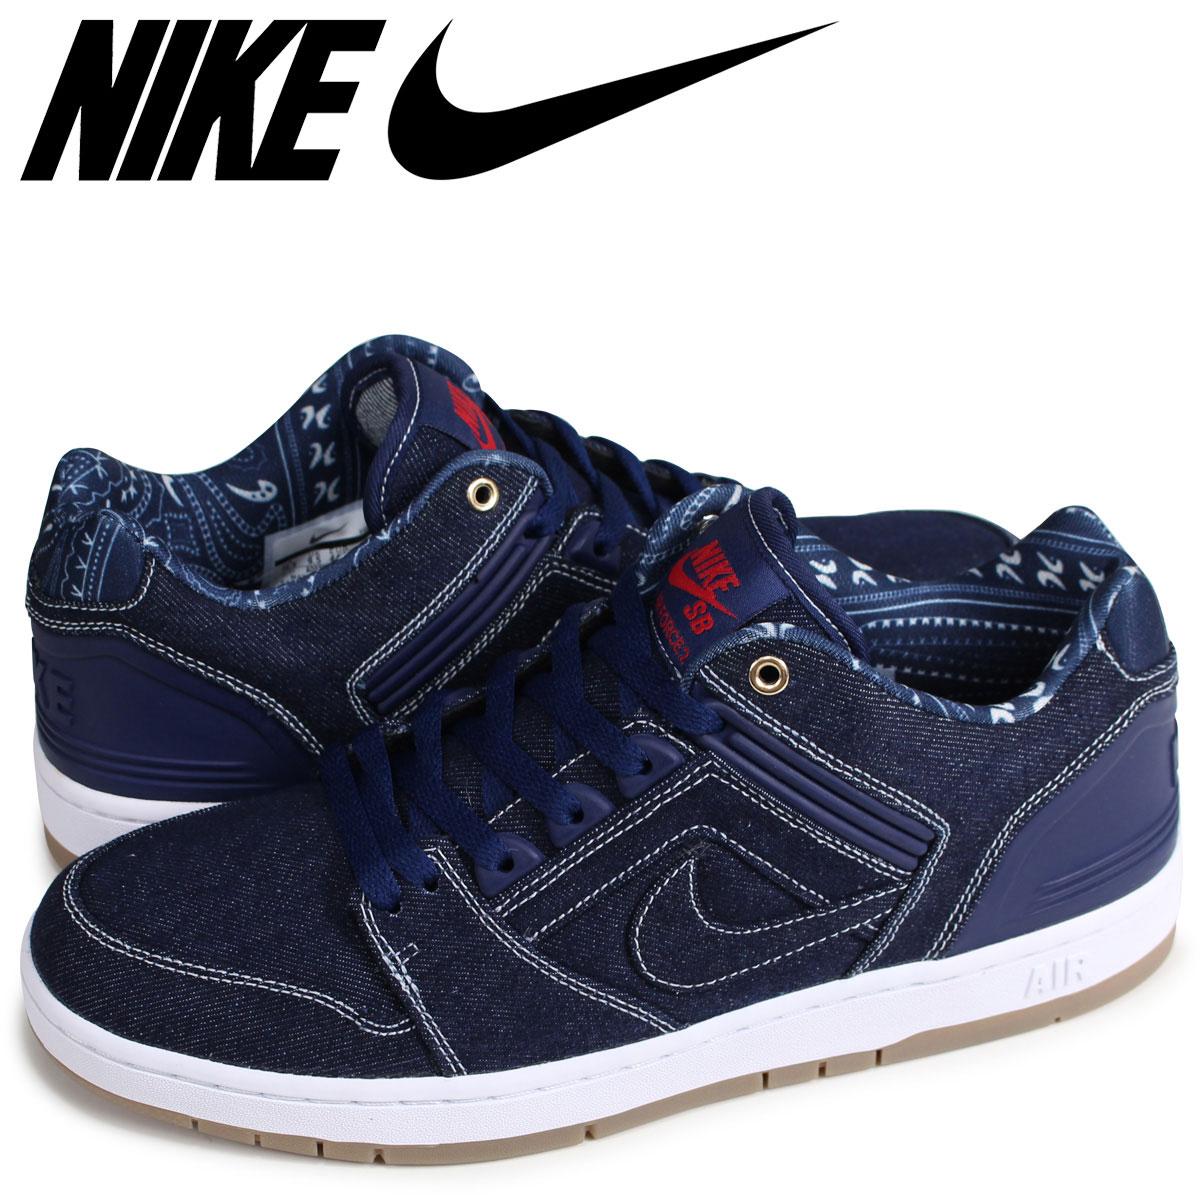 quality design 3fd35 66405 ALLSPORTS: Nike NIKE SB air force 2 sneakers men AIR FORCE 2 LOW QS 2PAC  navy AO0298-441 [196] | Rakuten Global Market